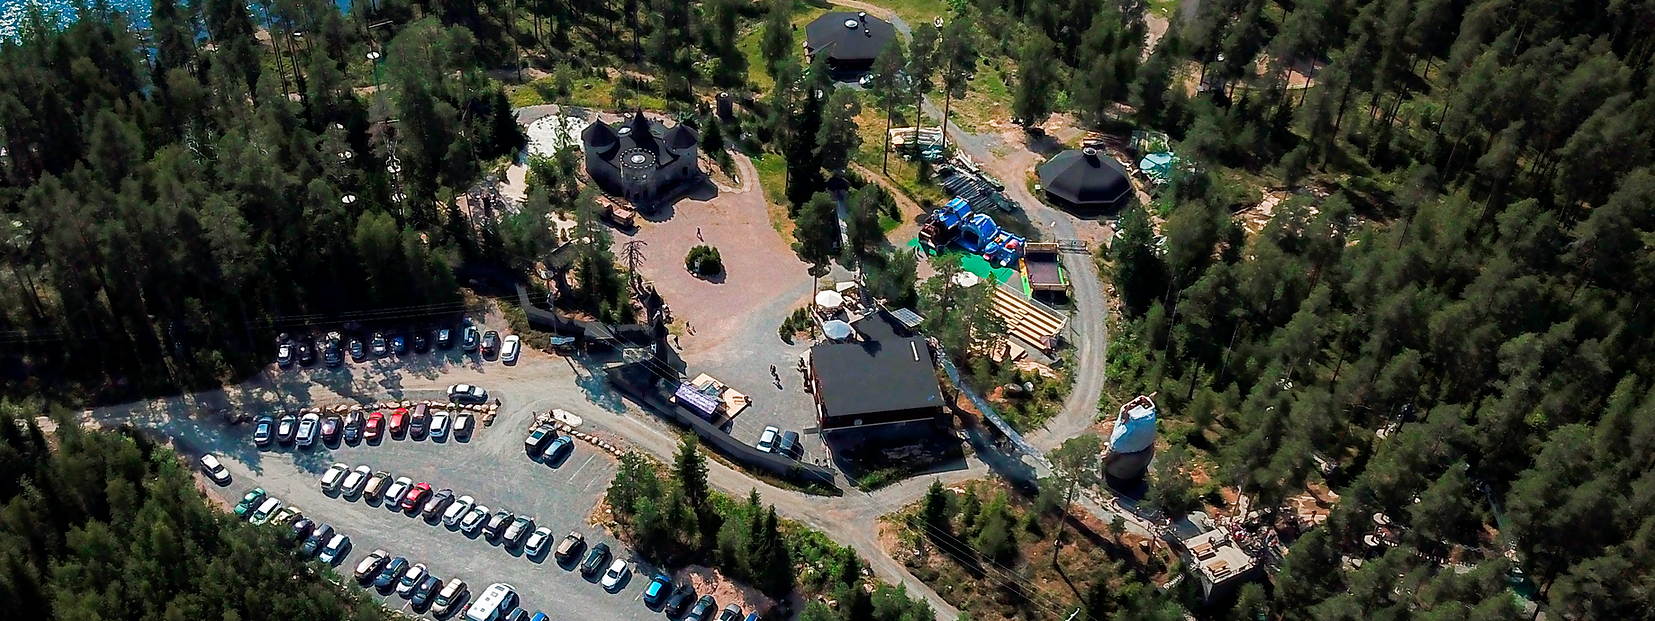 Drone alue kapea.png